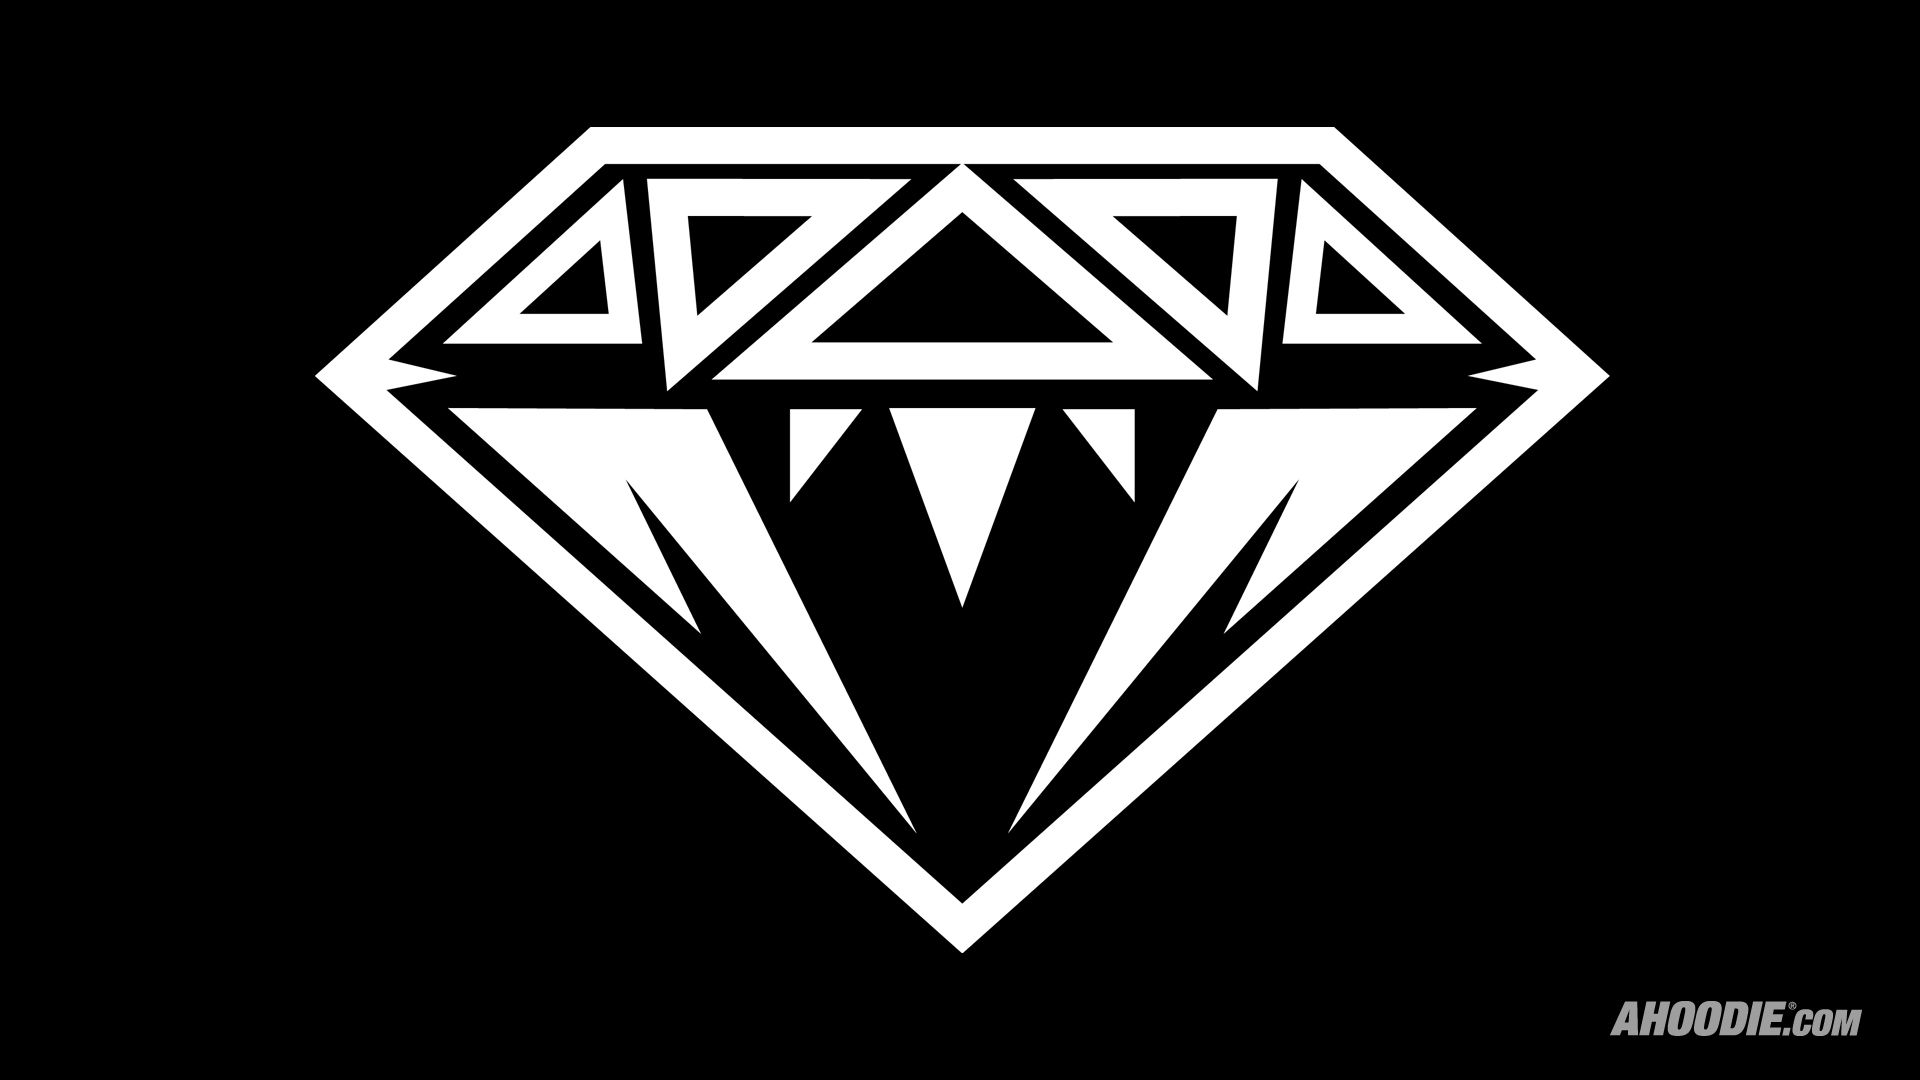 Logo nike wallpaper wallpapersafari - Diamond Co Wallpaper Wallpapersafari